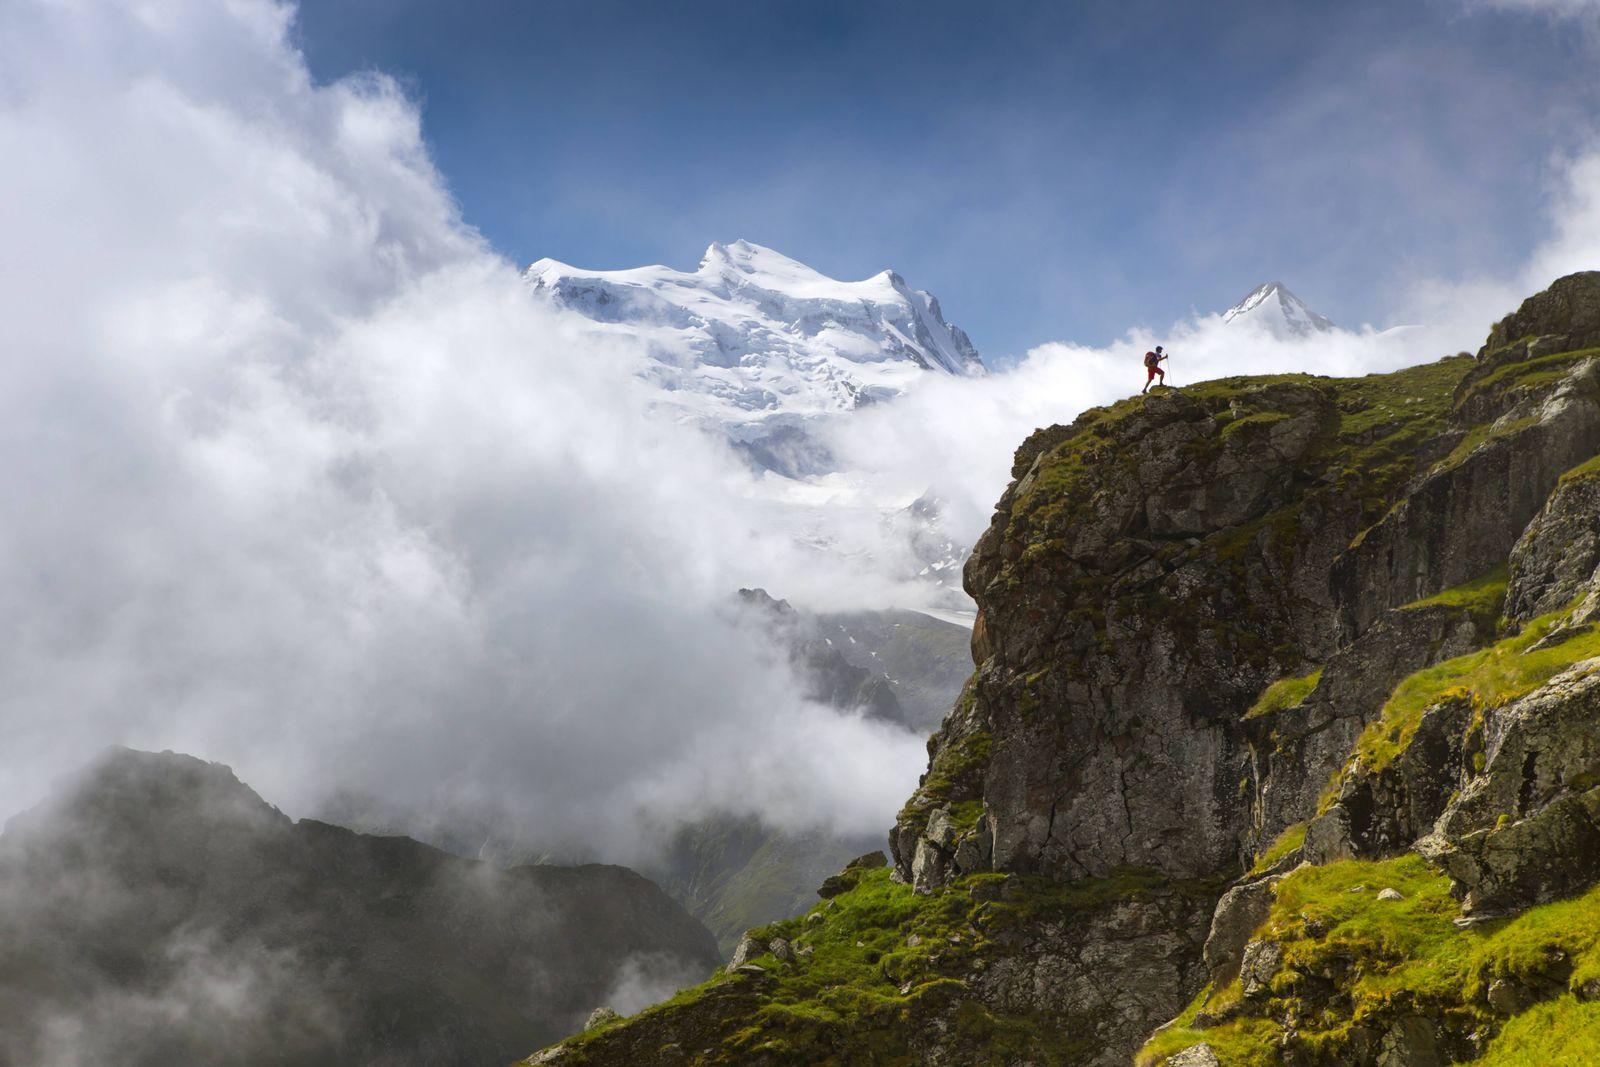 Hiker walking up steep ridge with mountain range in background Haute Route Wallis Switzerland model